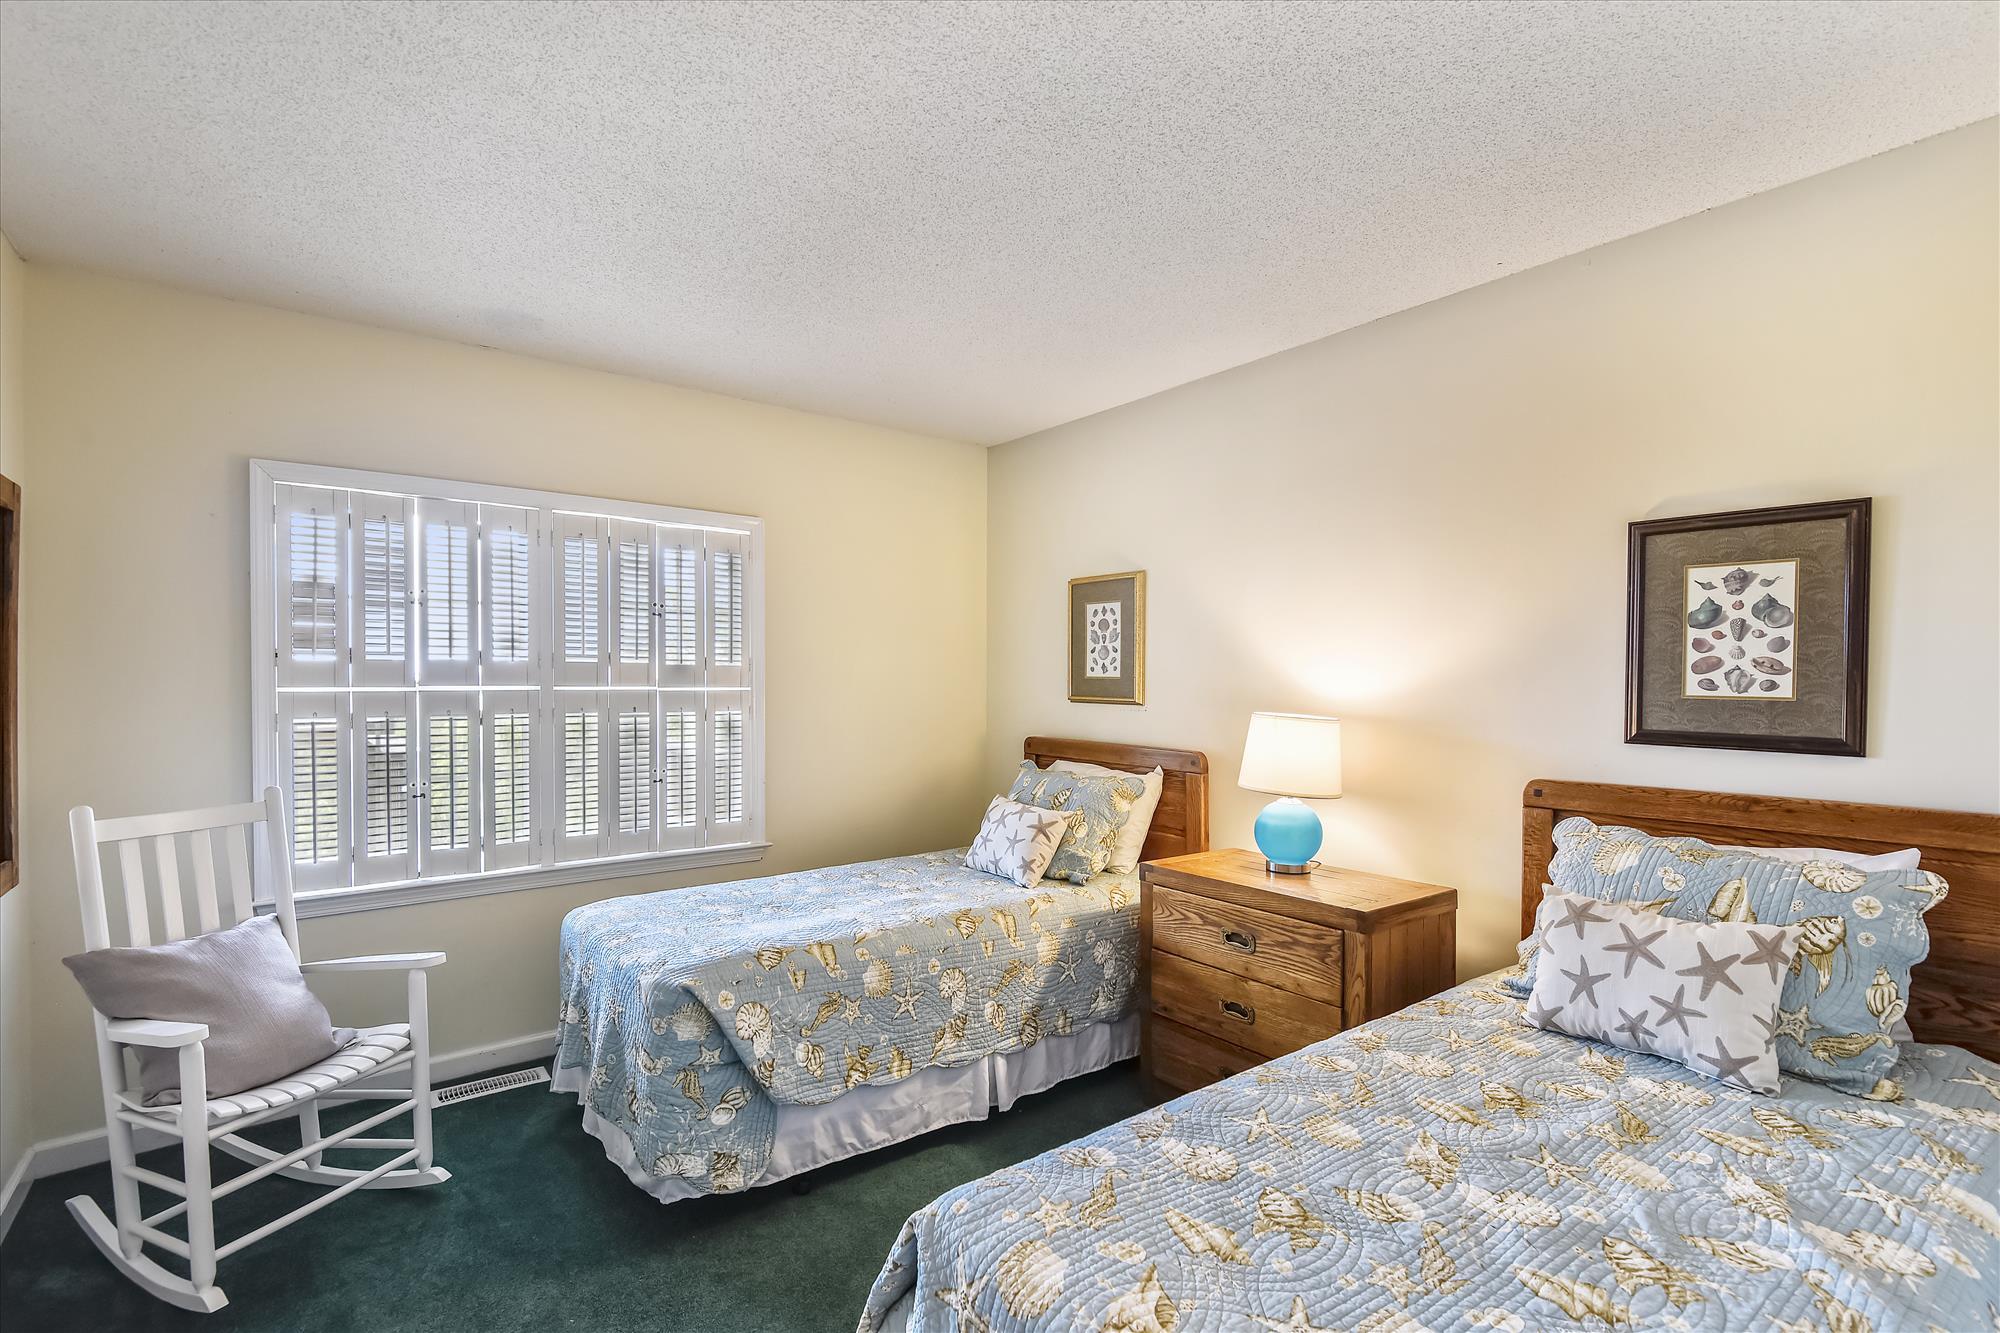 First Level-Bedroom 4-_DSC9587